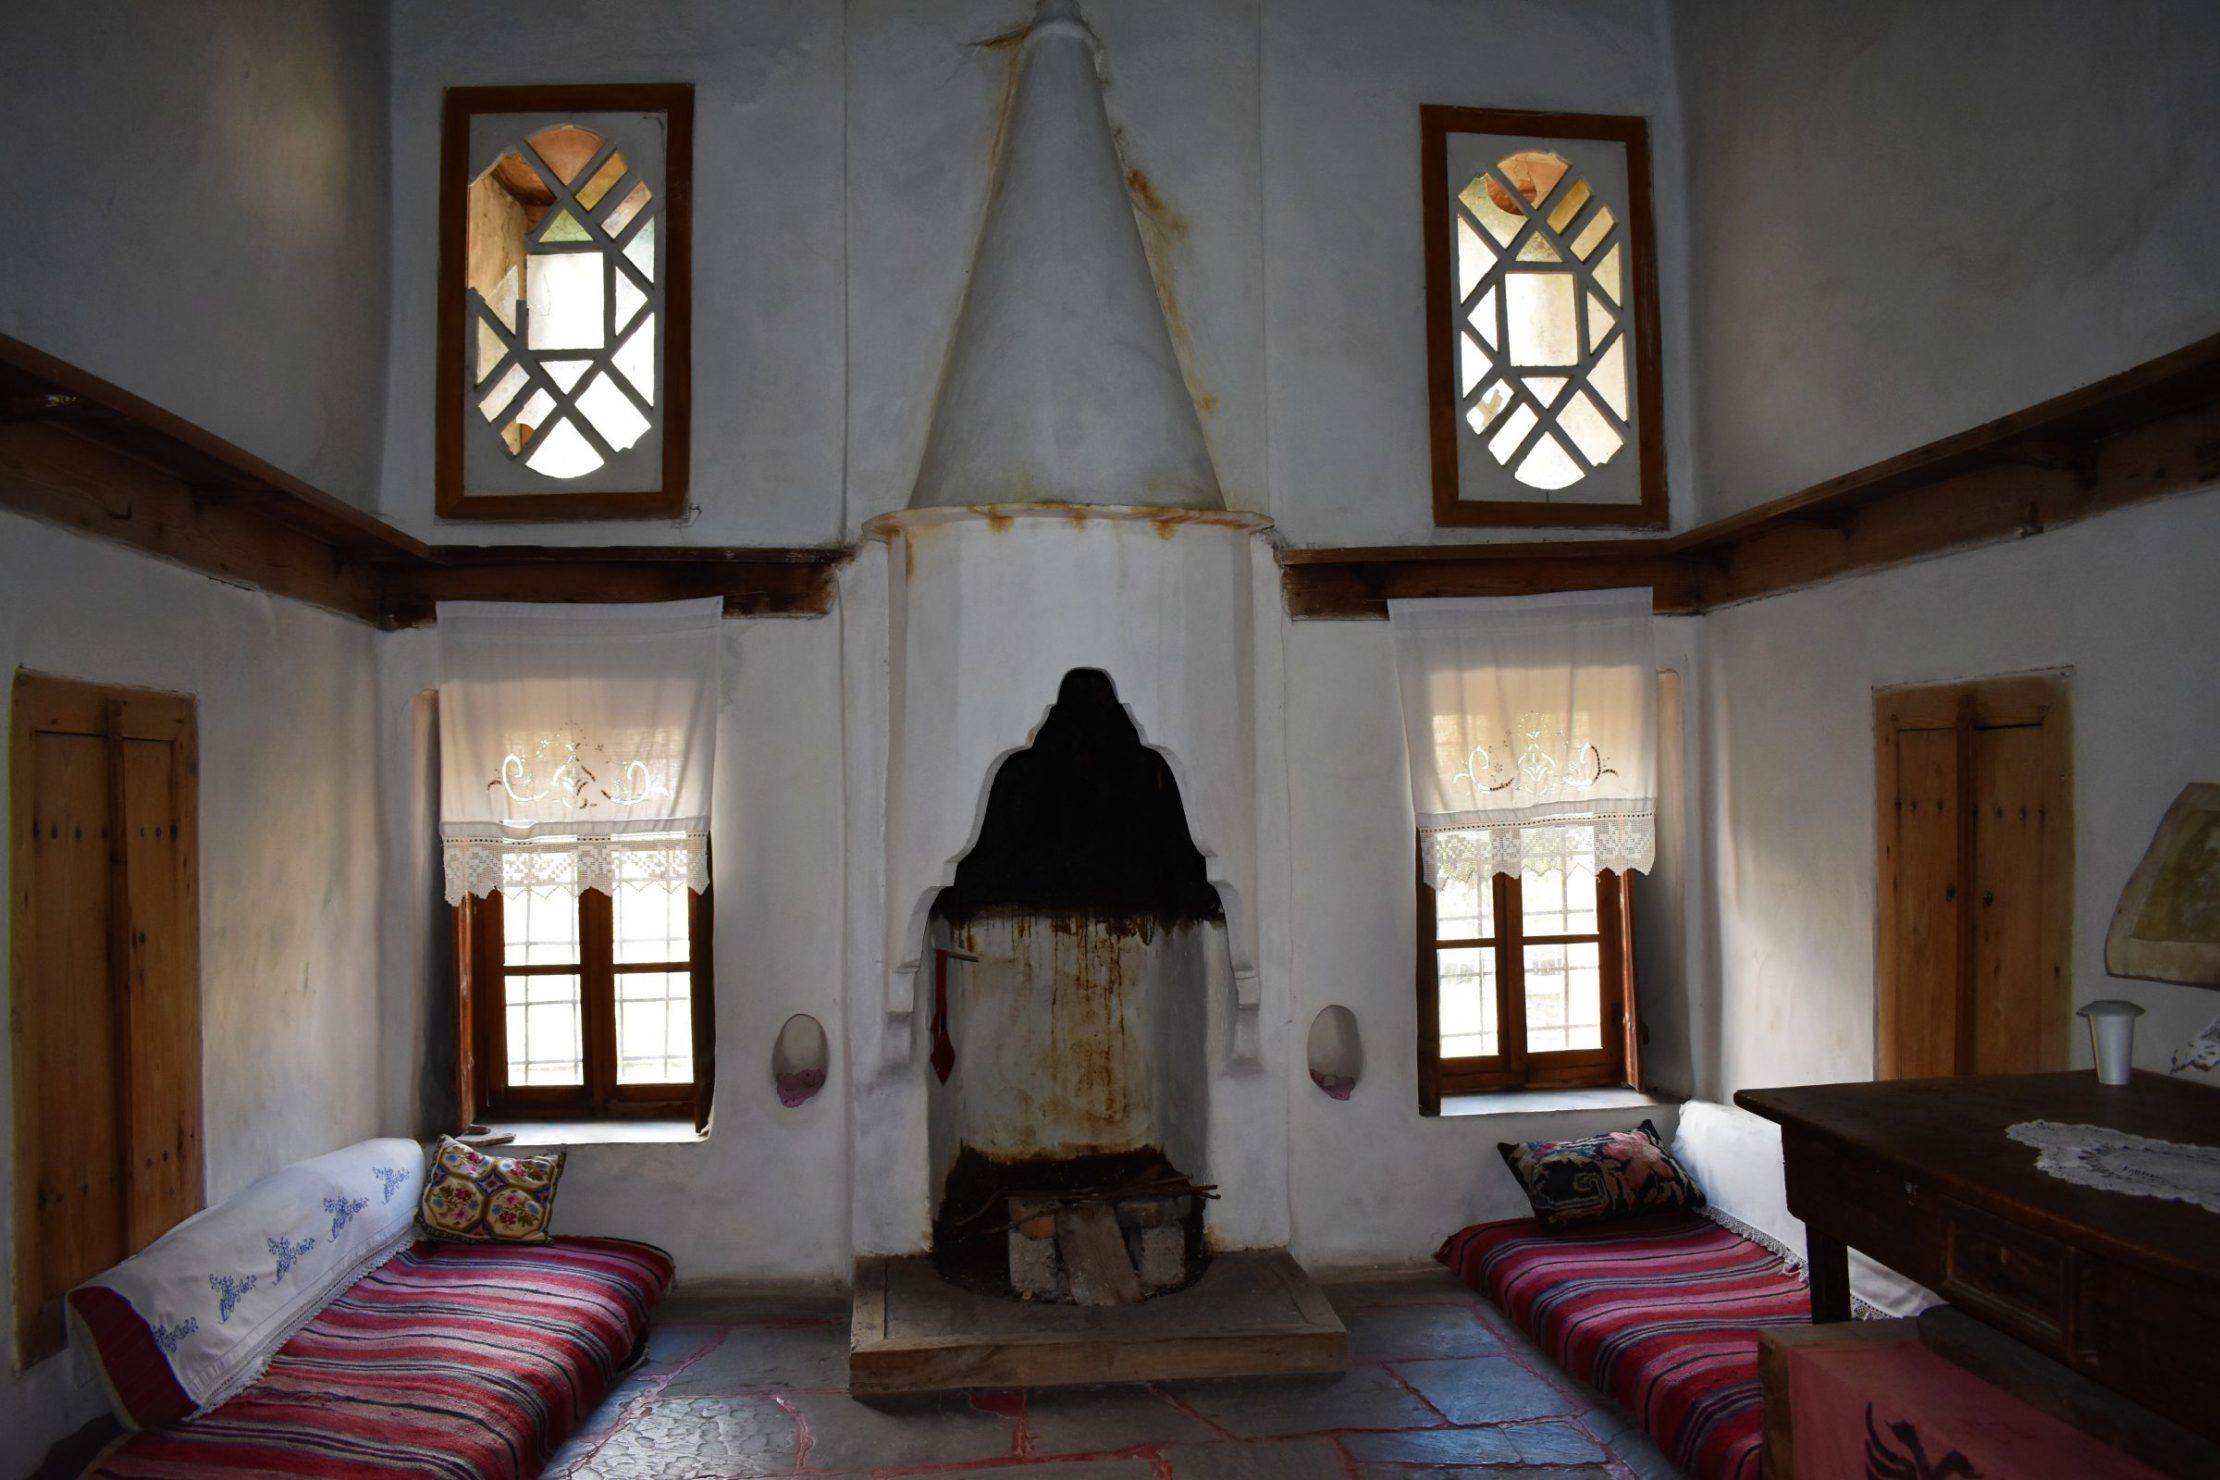 Traditional old Skenduli House in Gjirokastra, Albania